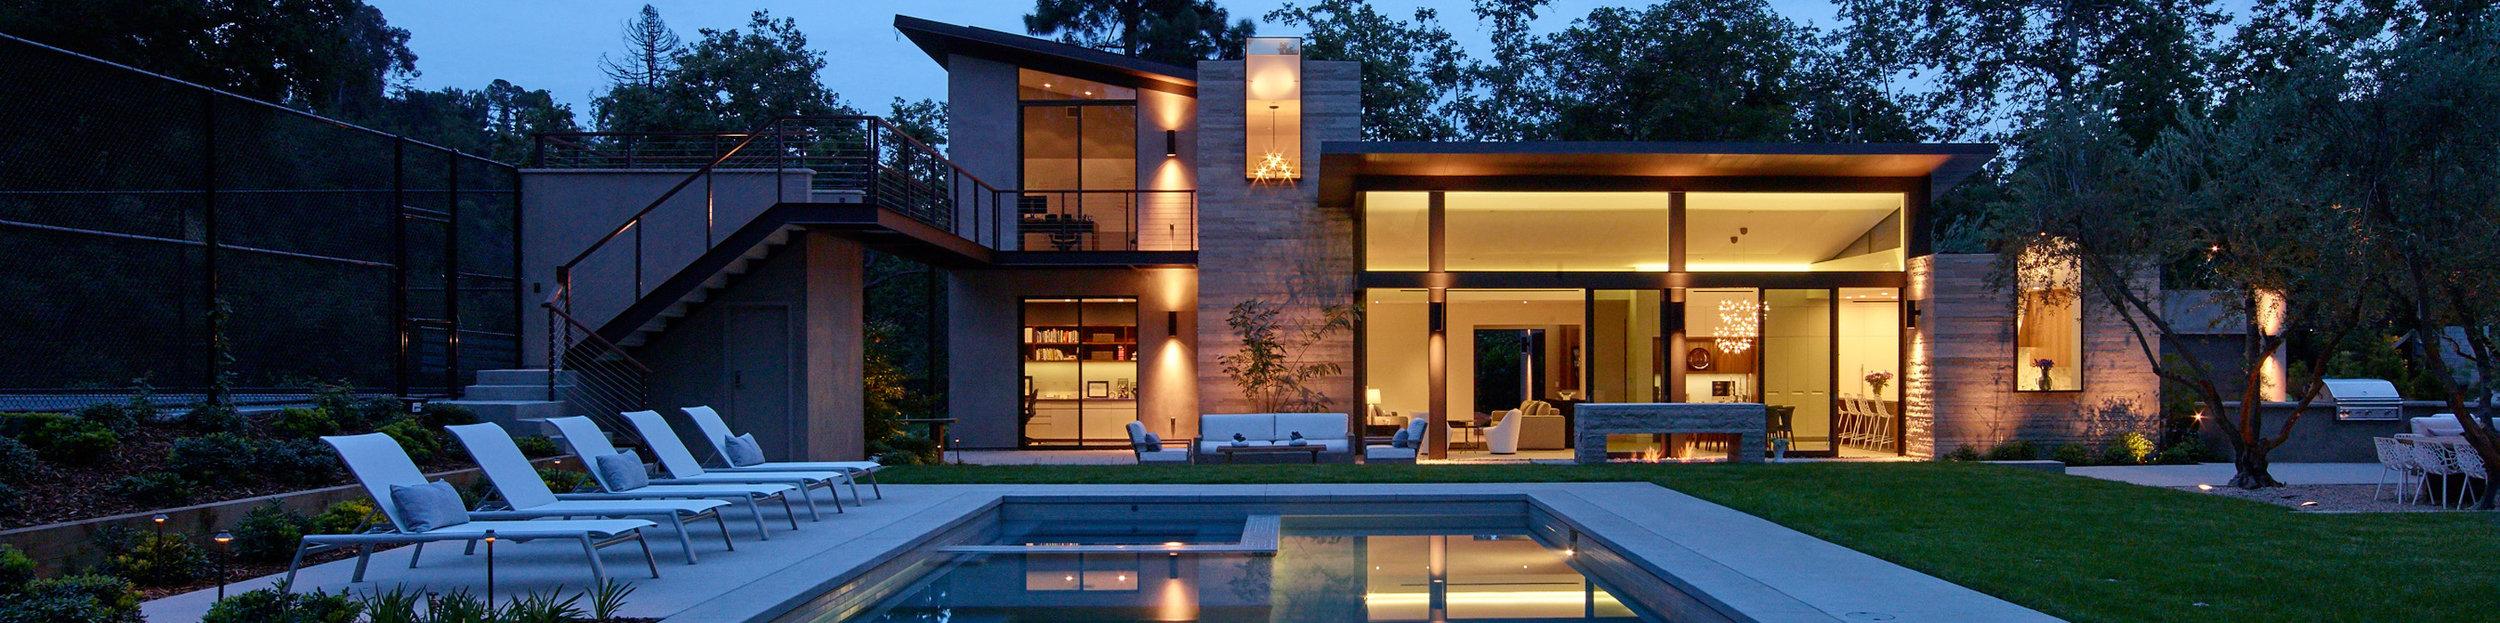 mandeville house - .